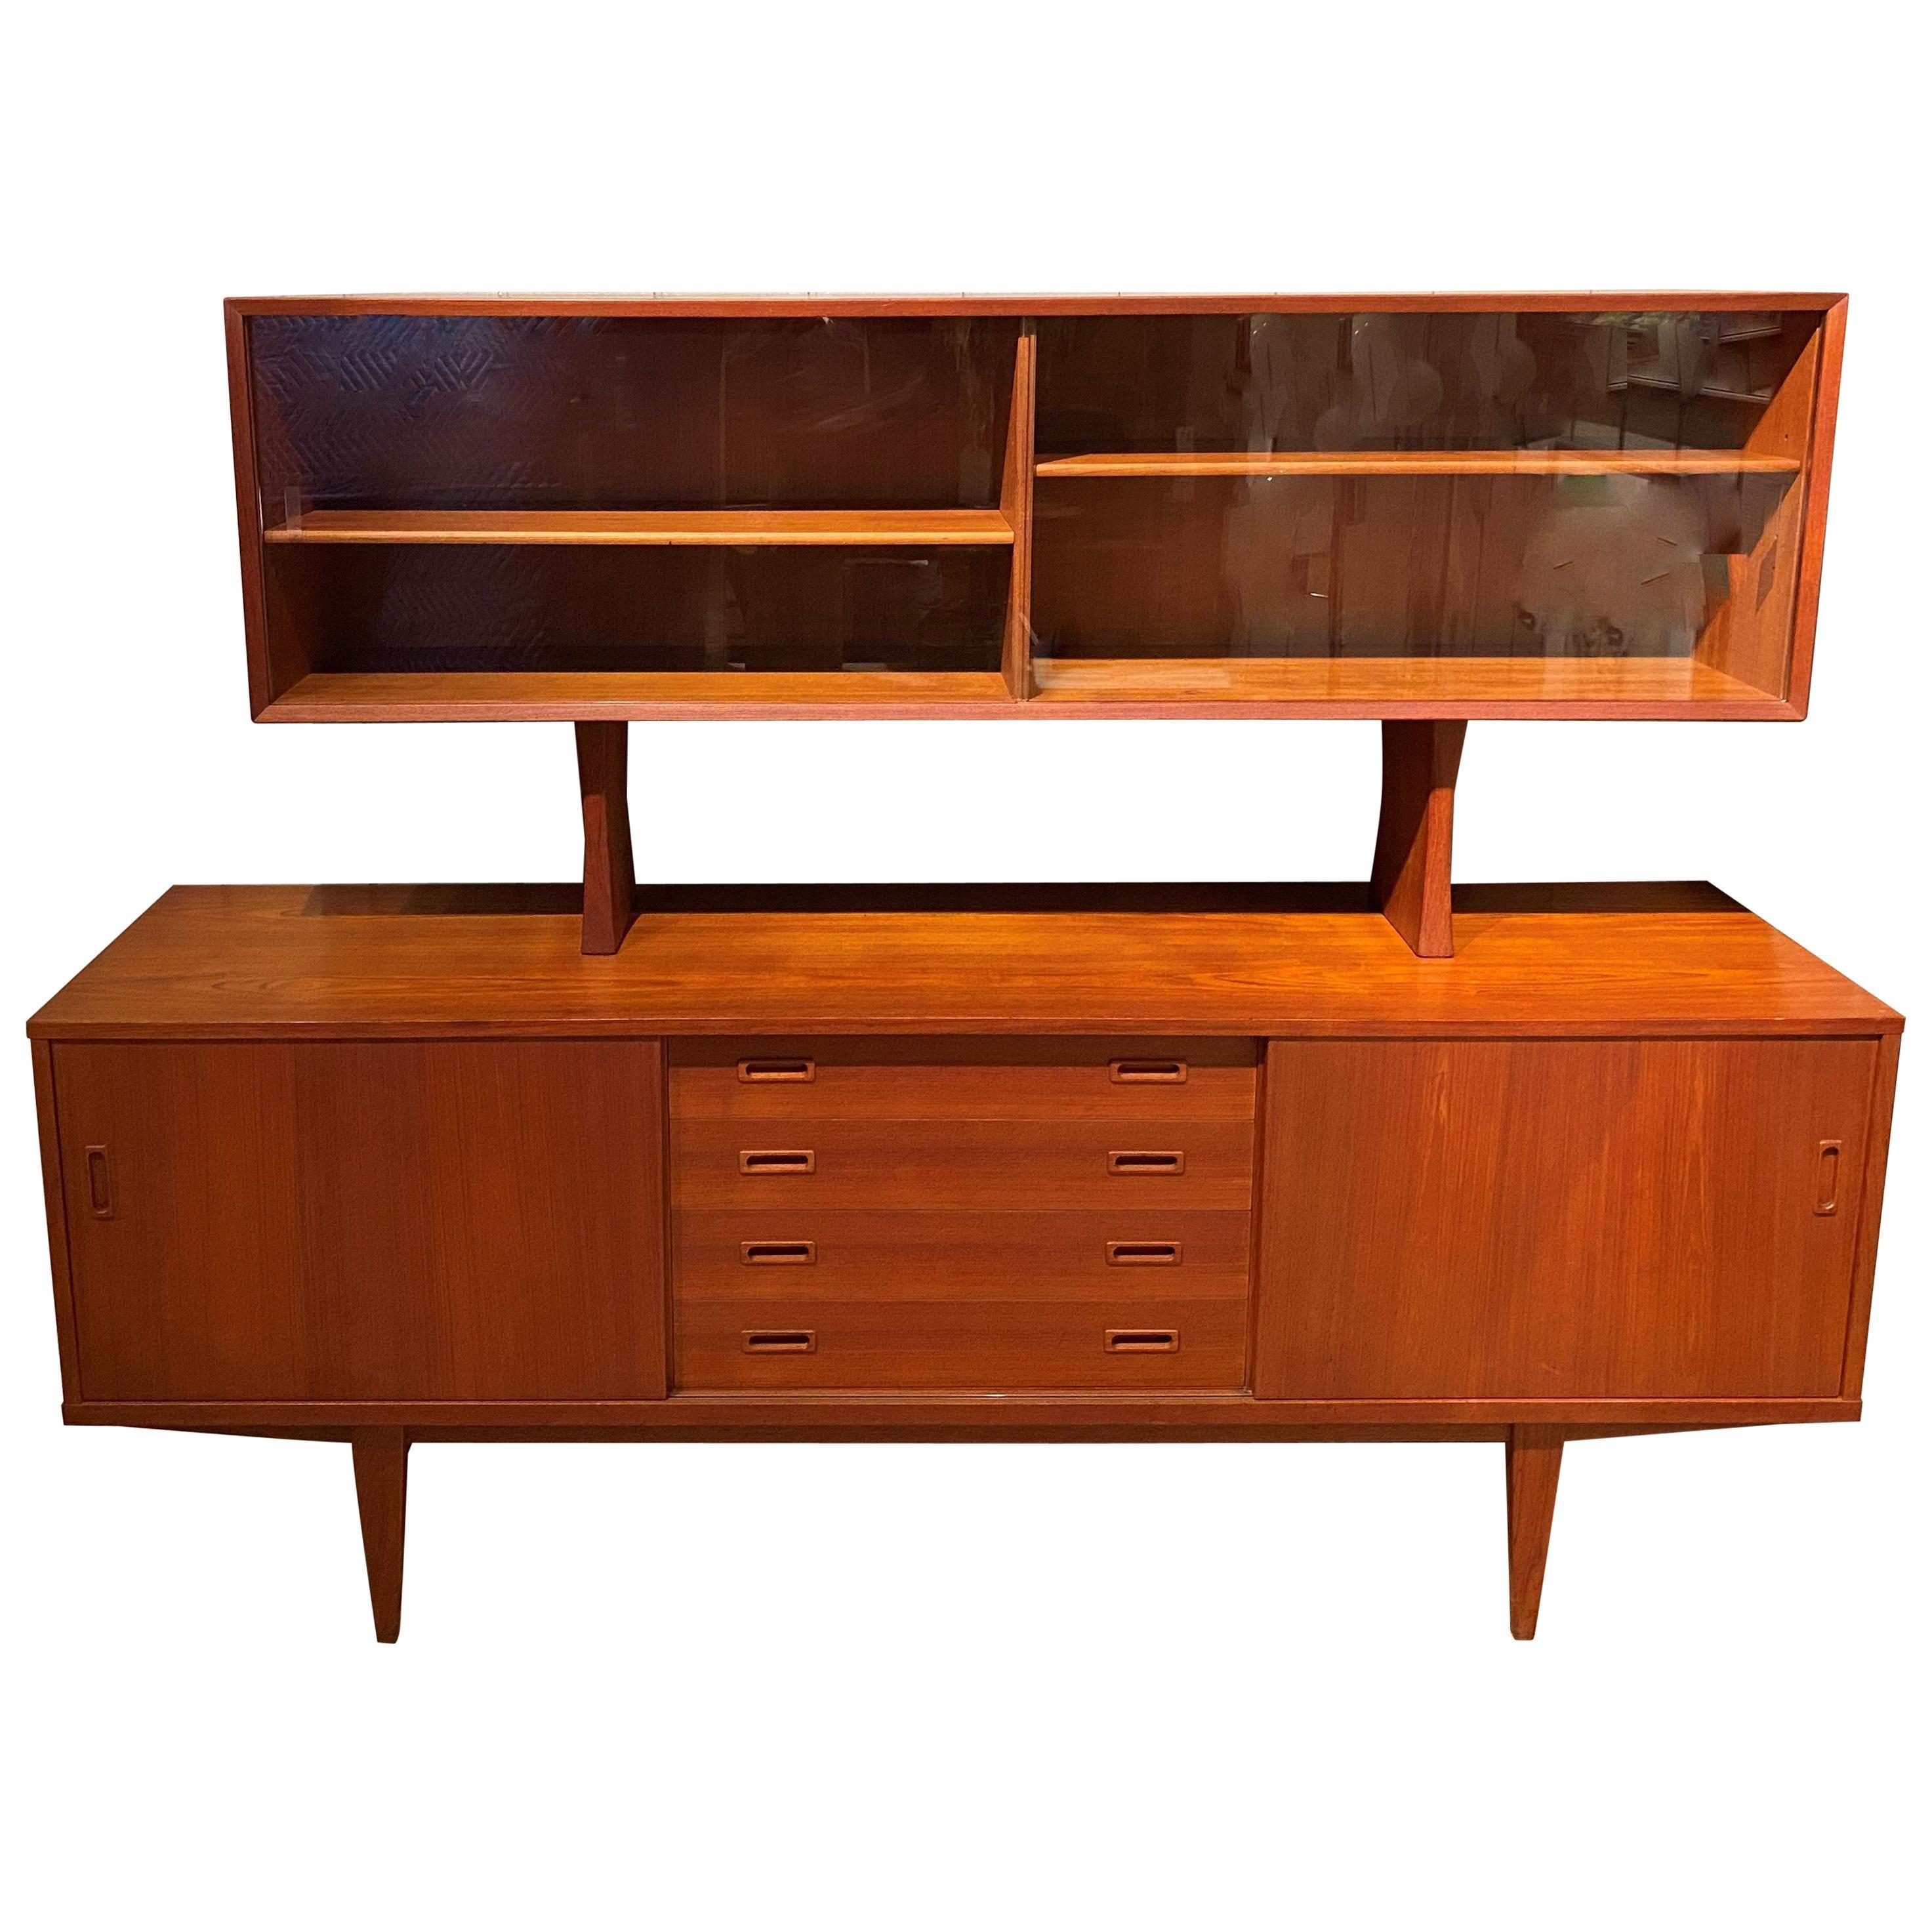 Grete Jalk Danish Midcentury Teak Credenza with Upper Display Cabinet